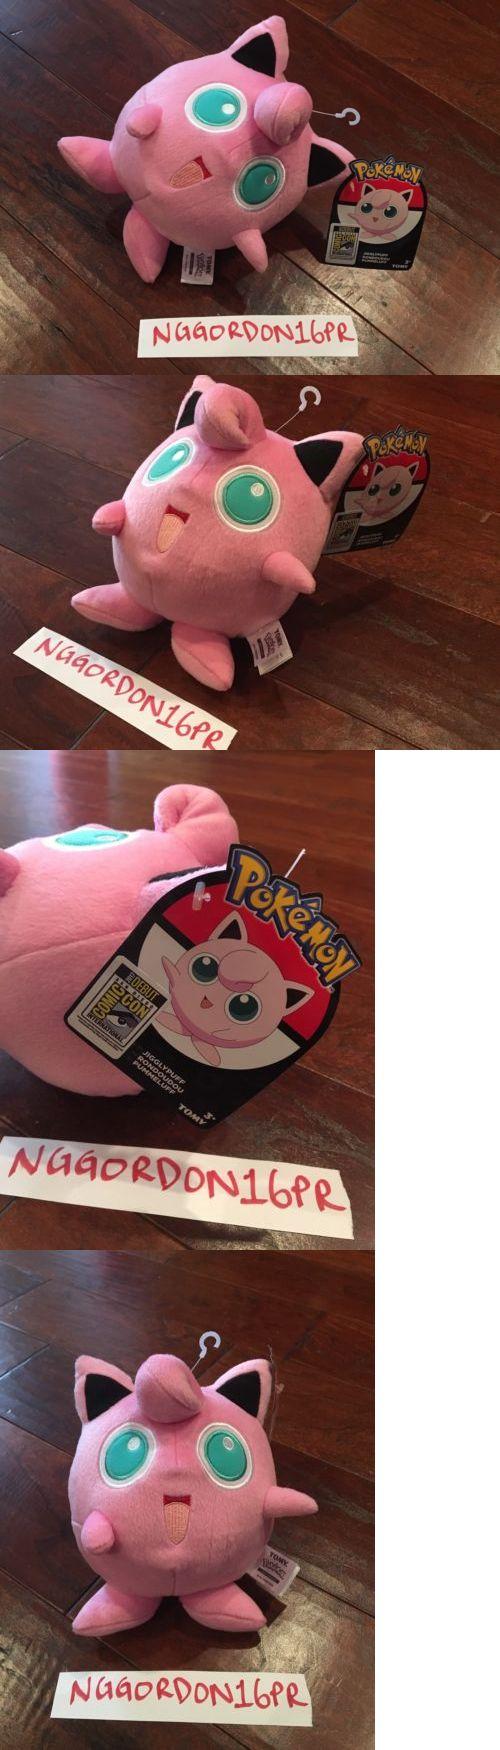 Pok mon 1524: Pokémon Jigglypuff Sdcc 2017 Exclusive Plush Doll By Tomy Toy Venusaur Pikachu -> BUY IT NOW ONLY: $40 on eBay!